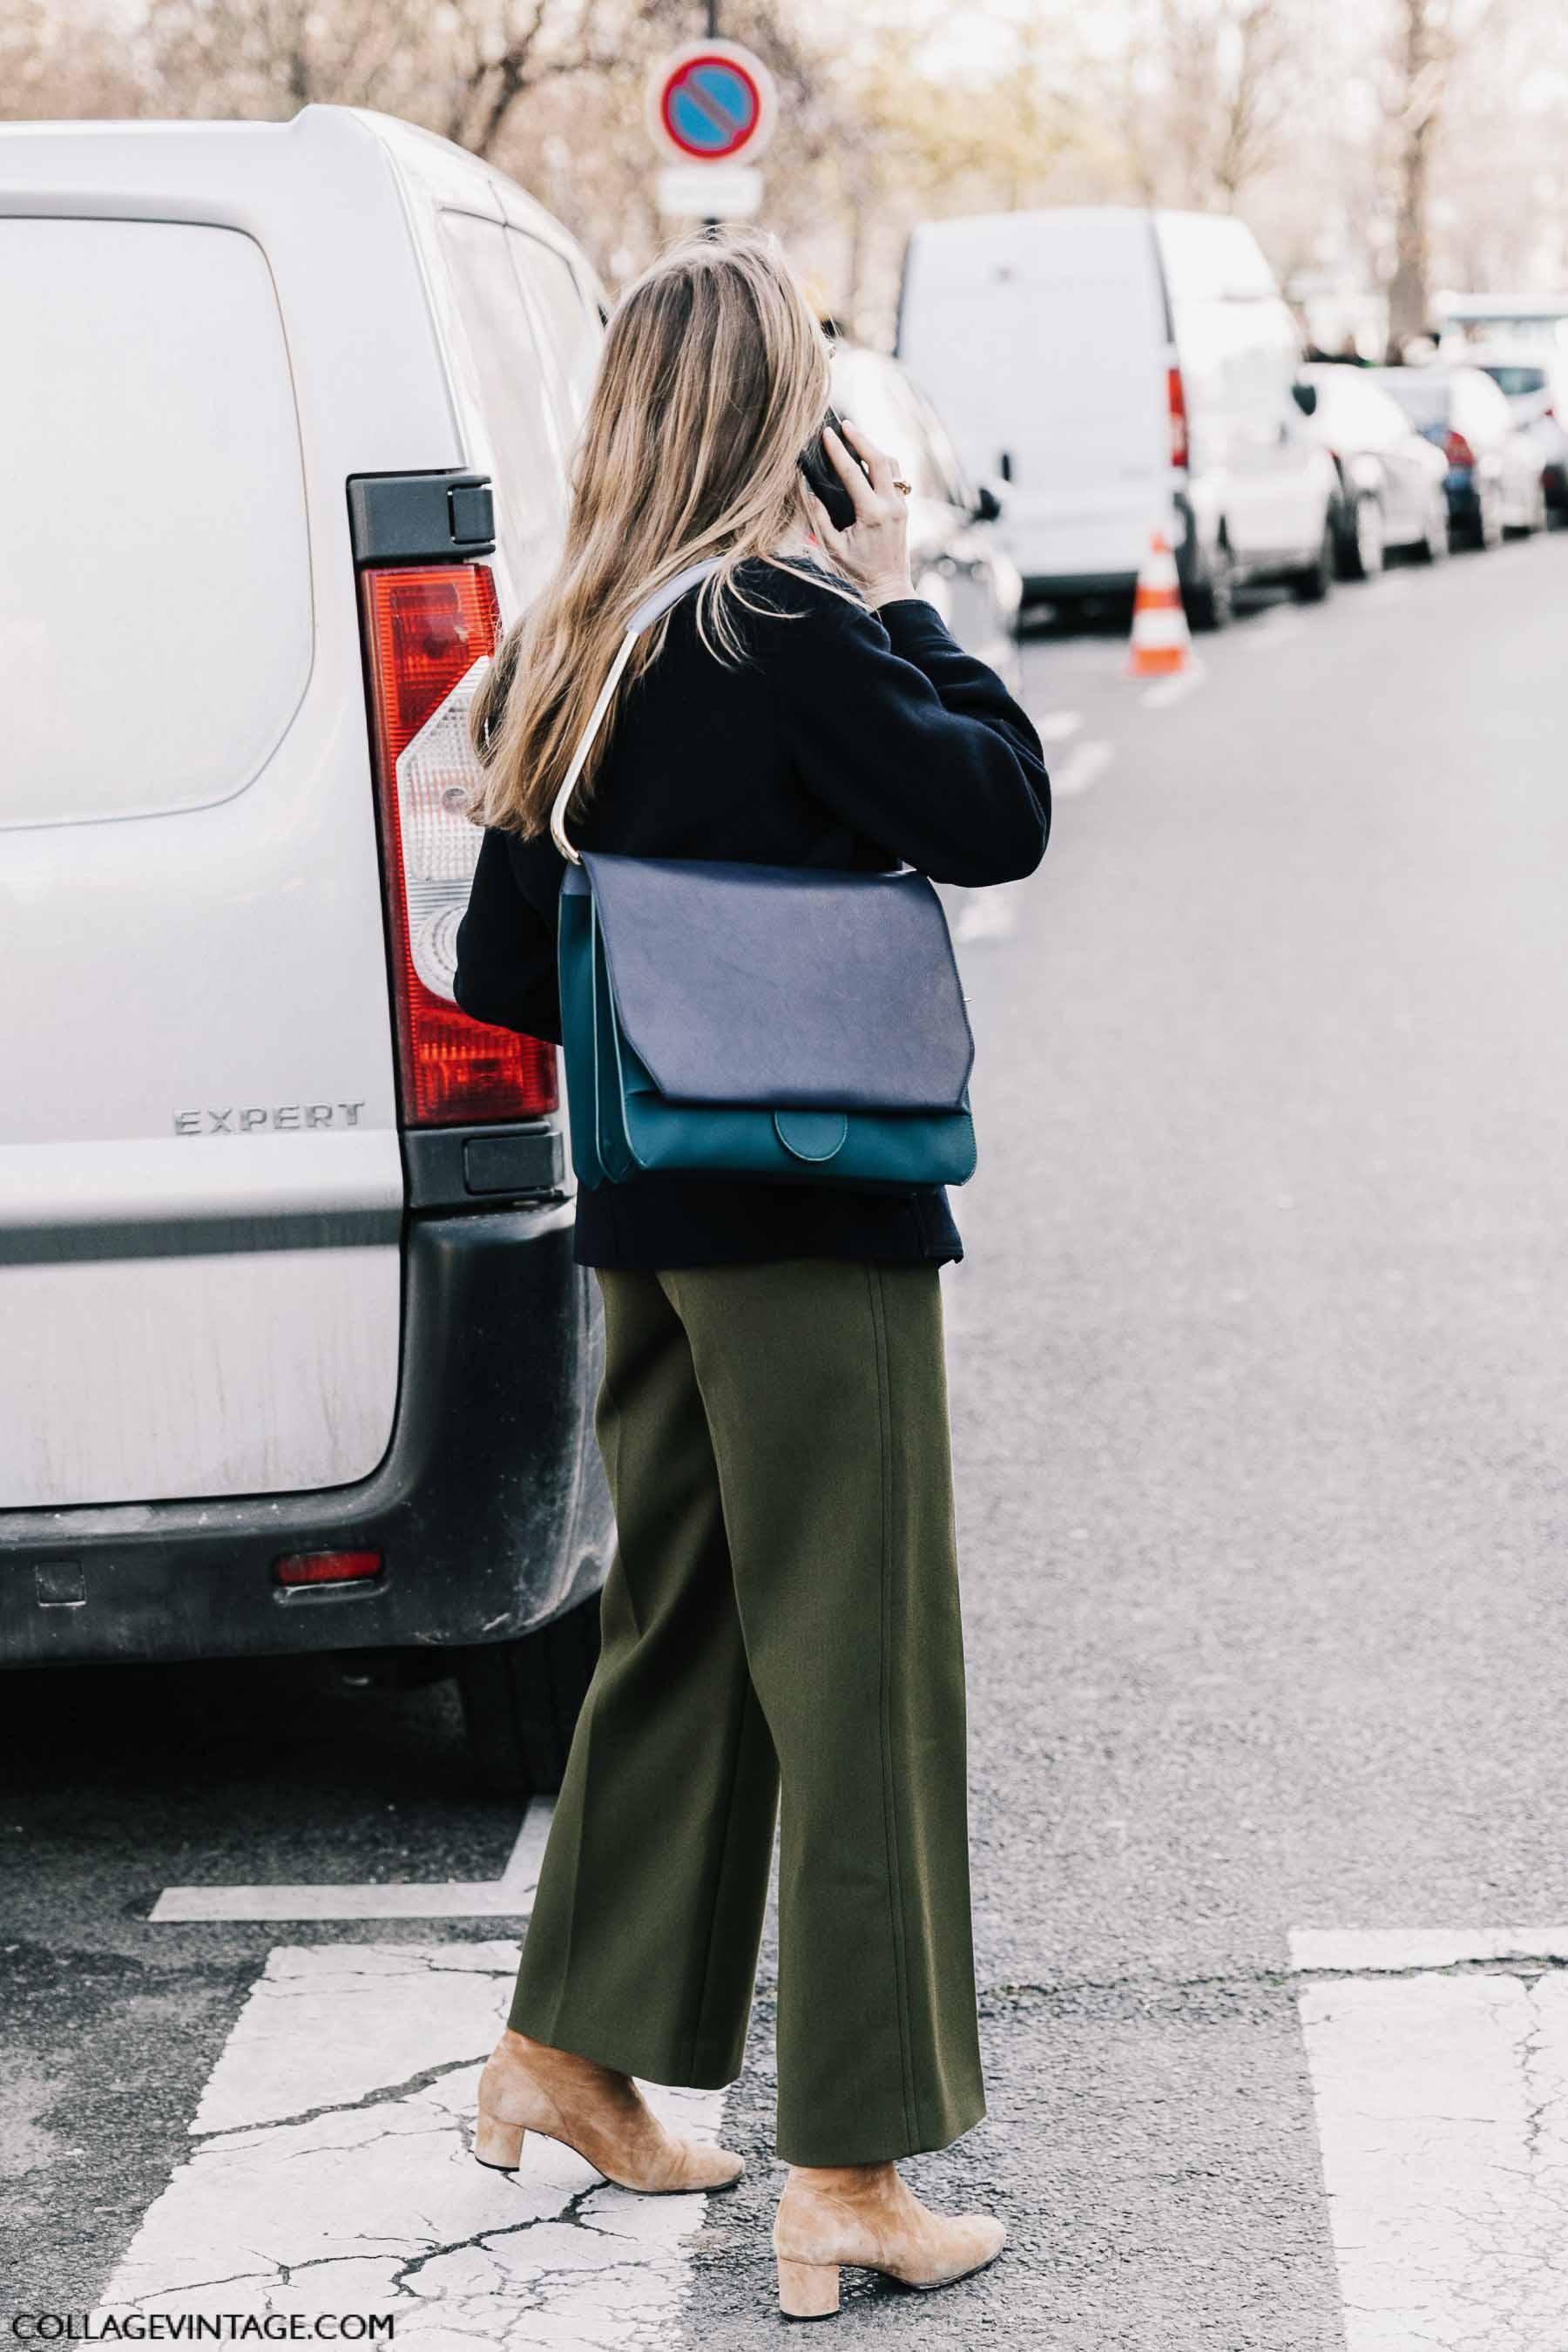 осень-зима 2017, парижский гардероб, parisian chic, parisian street style